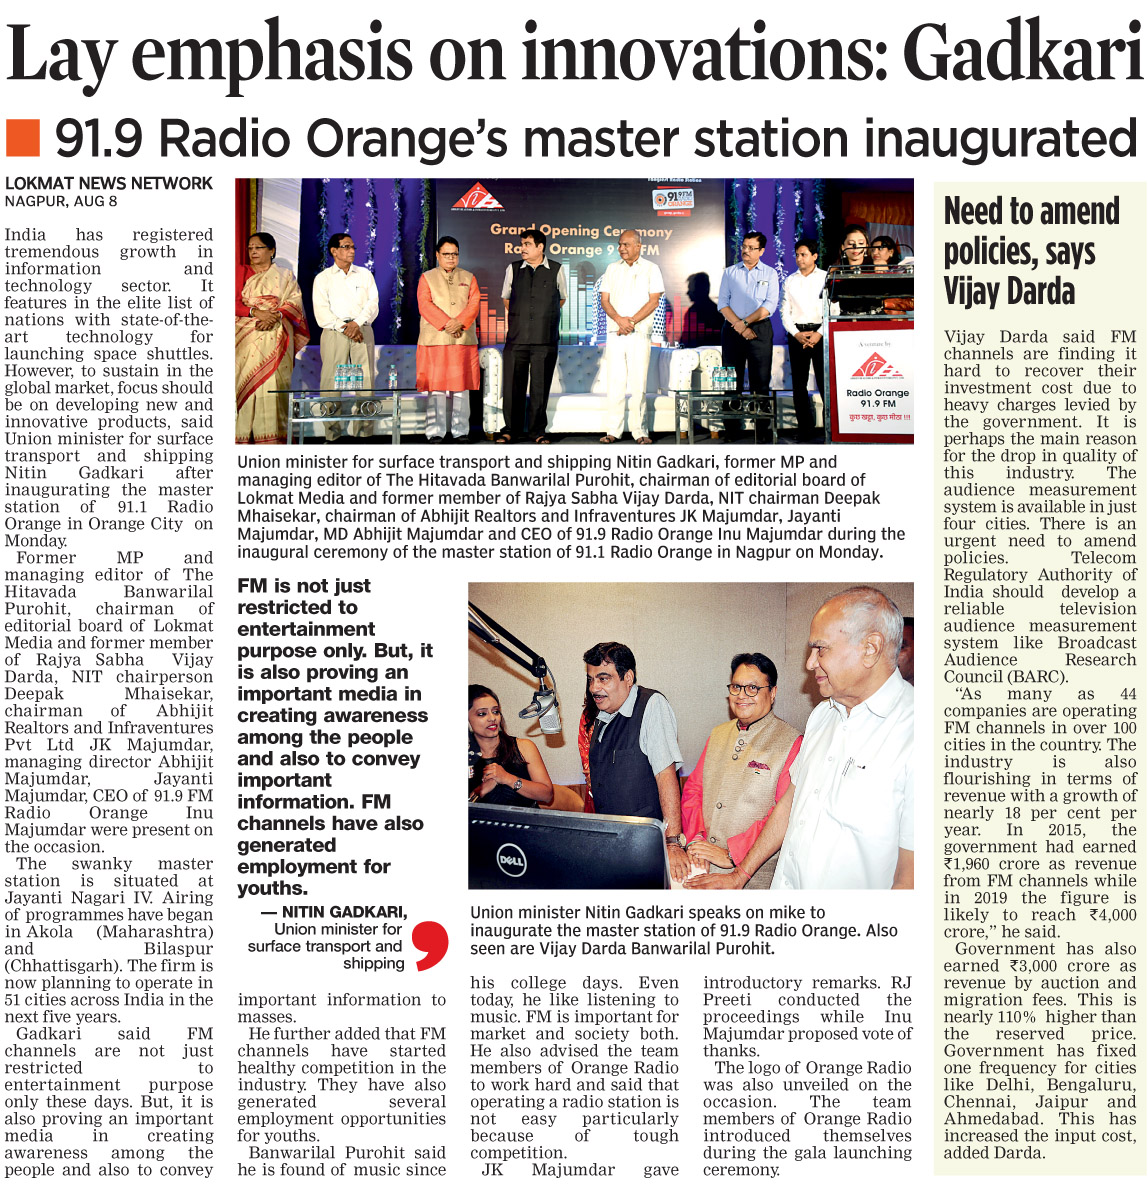 Lay emphasis on innovations: Gadkari